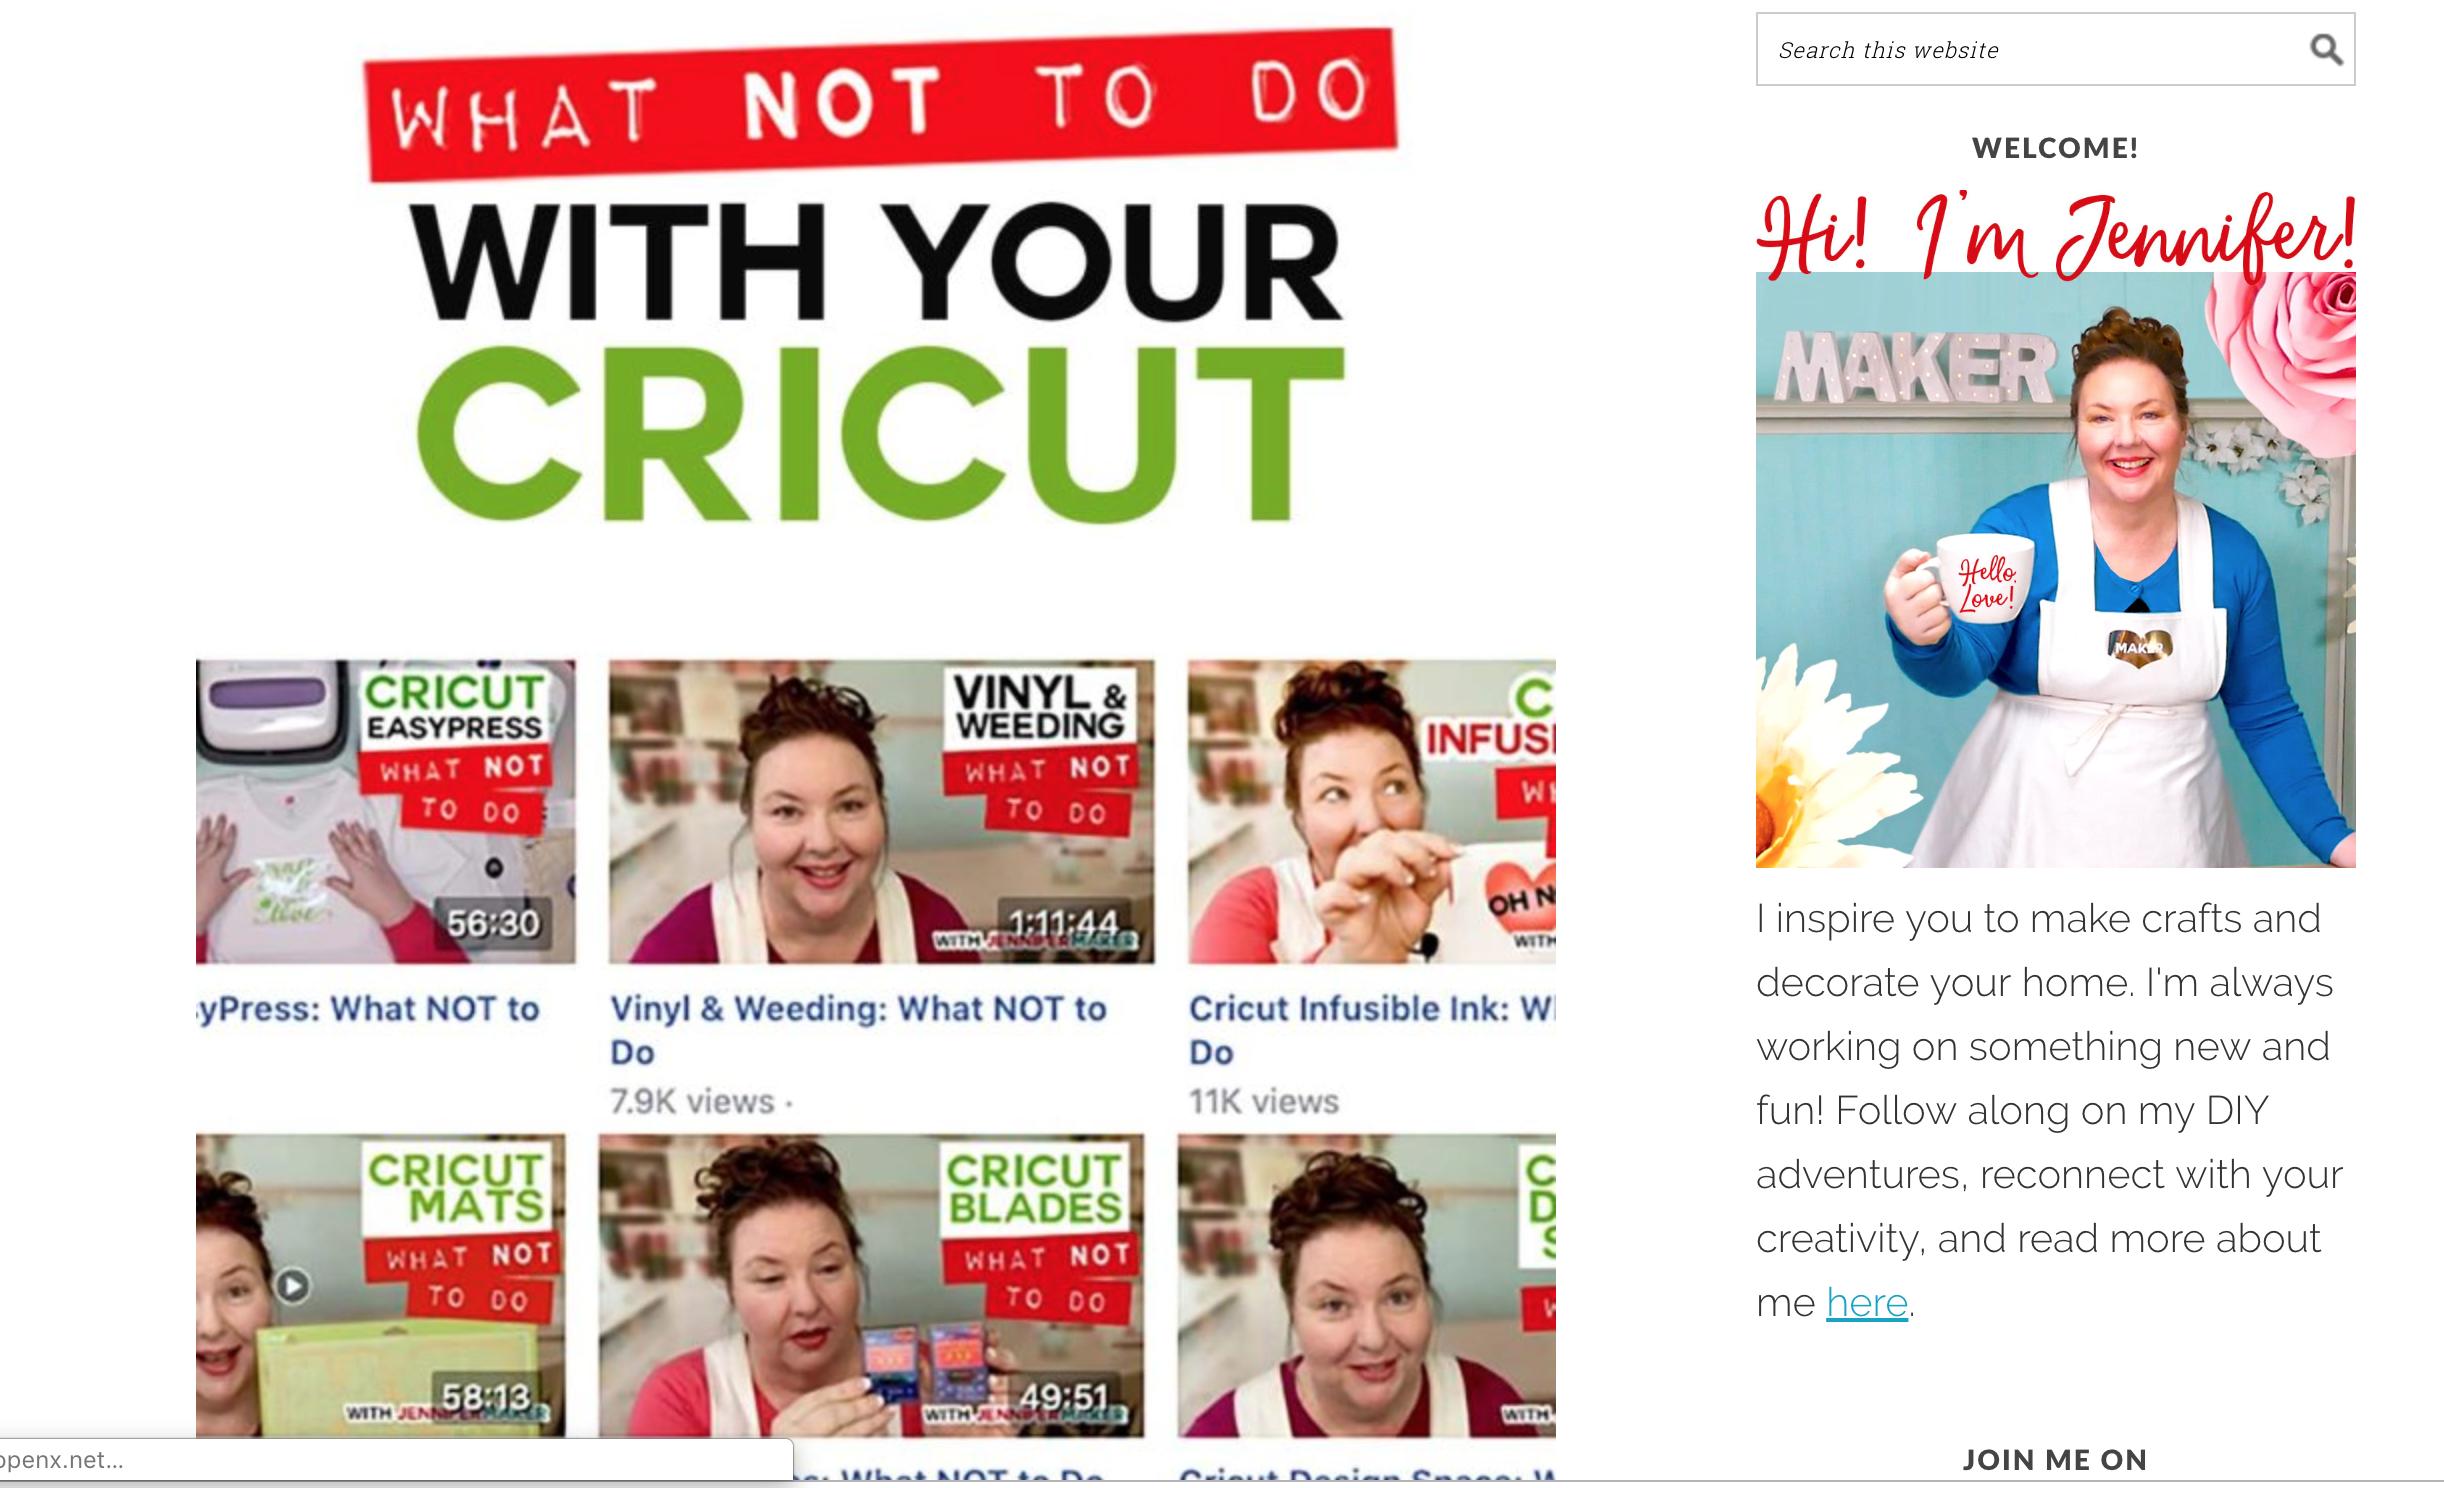 Screenshot of Jennifer Maker's blog